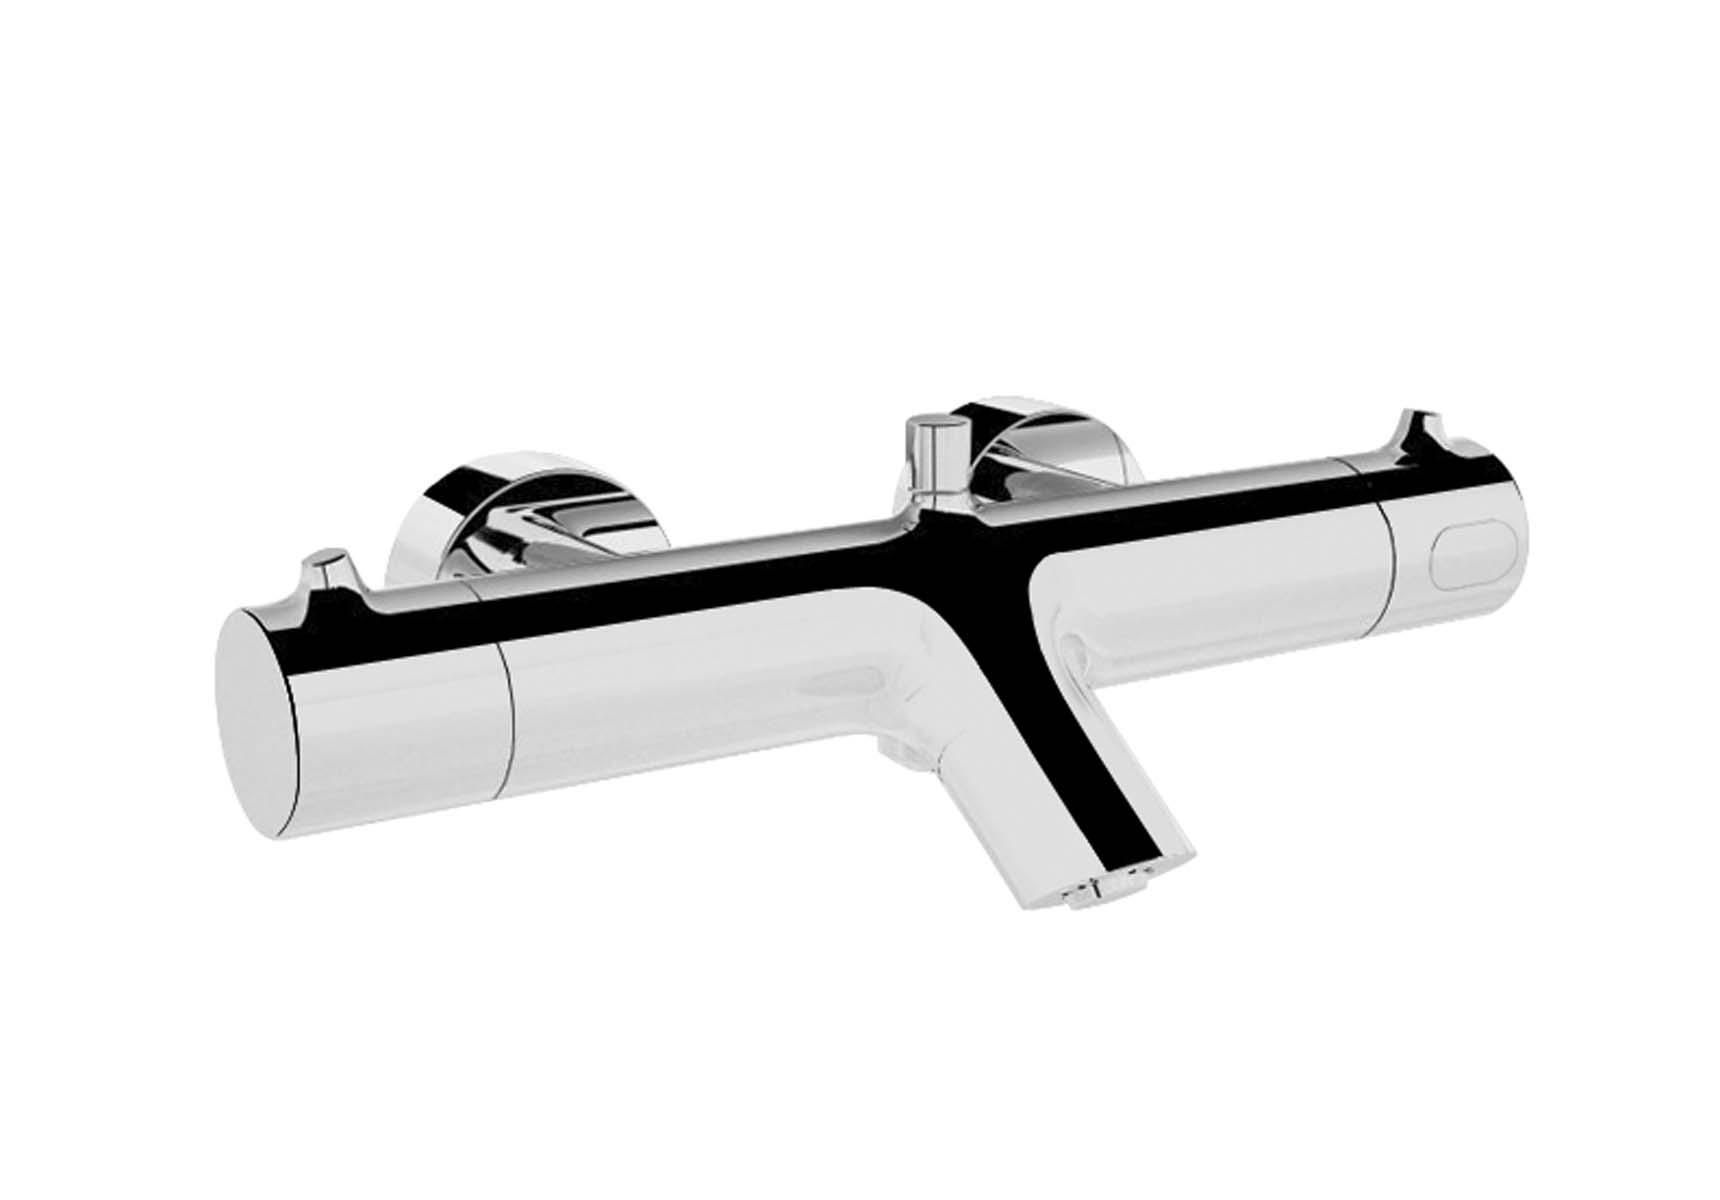 Aquatech Nest Trendy Thermostatic Bath/Shower Mixer